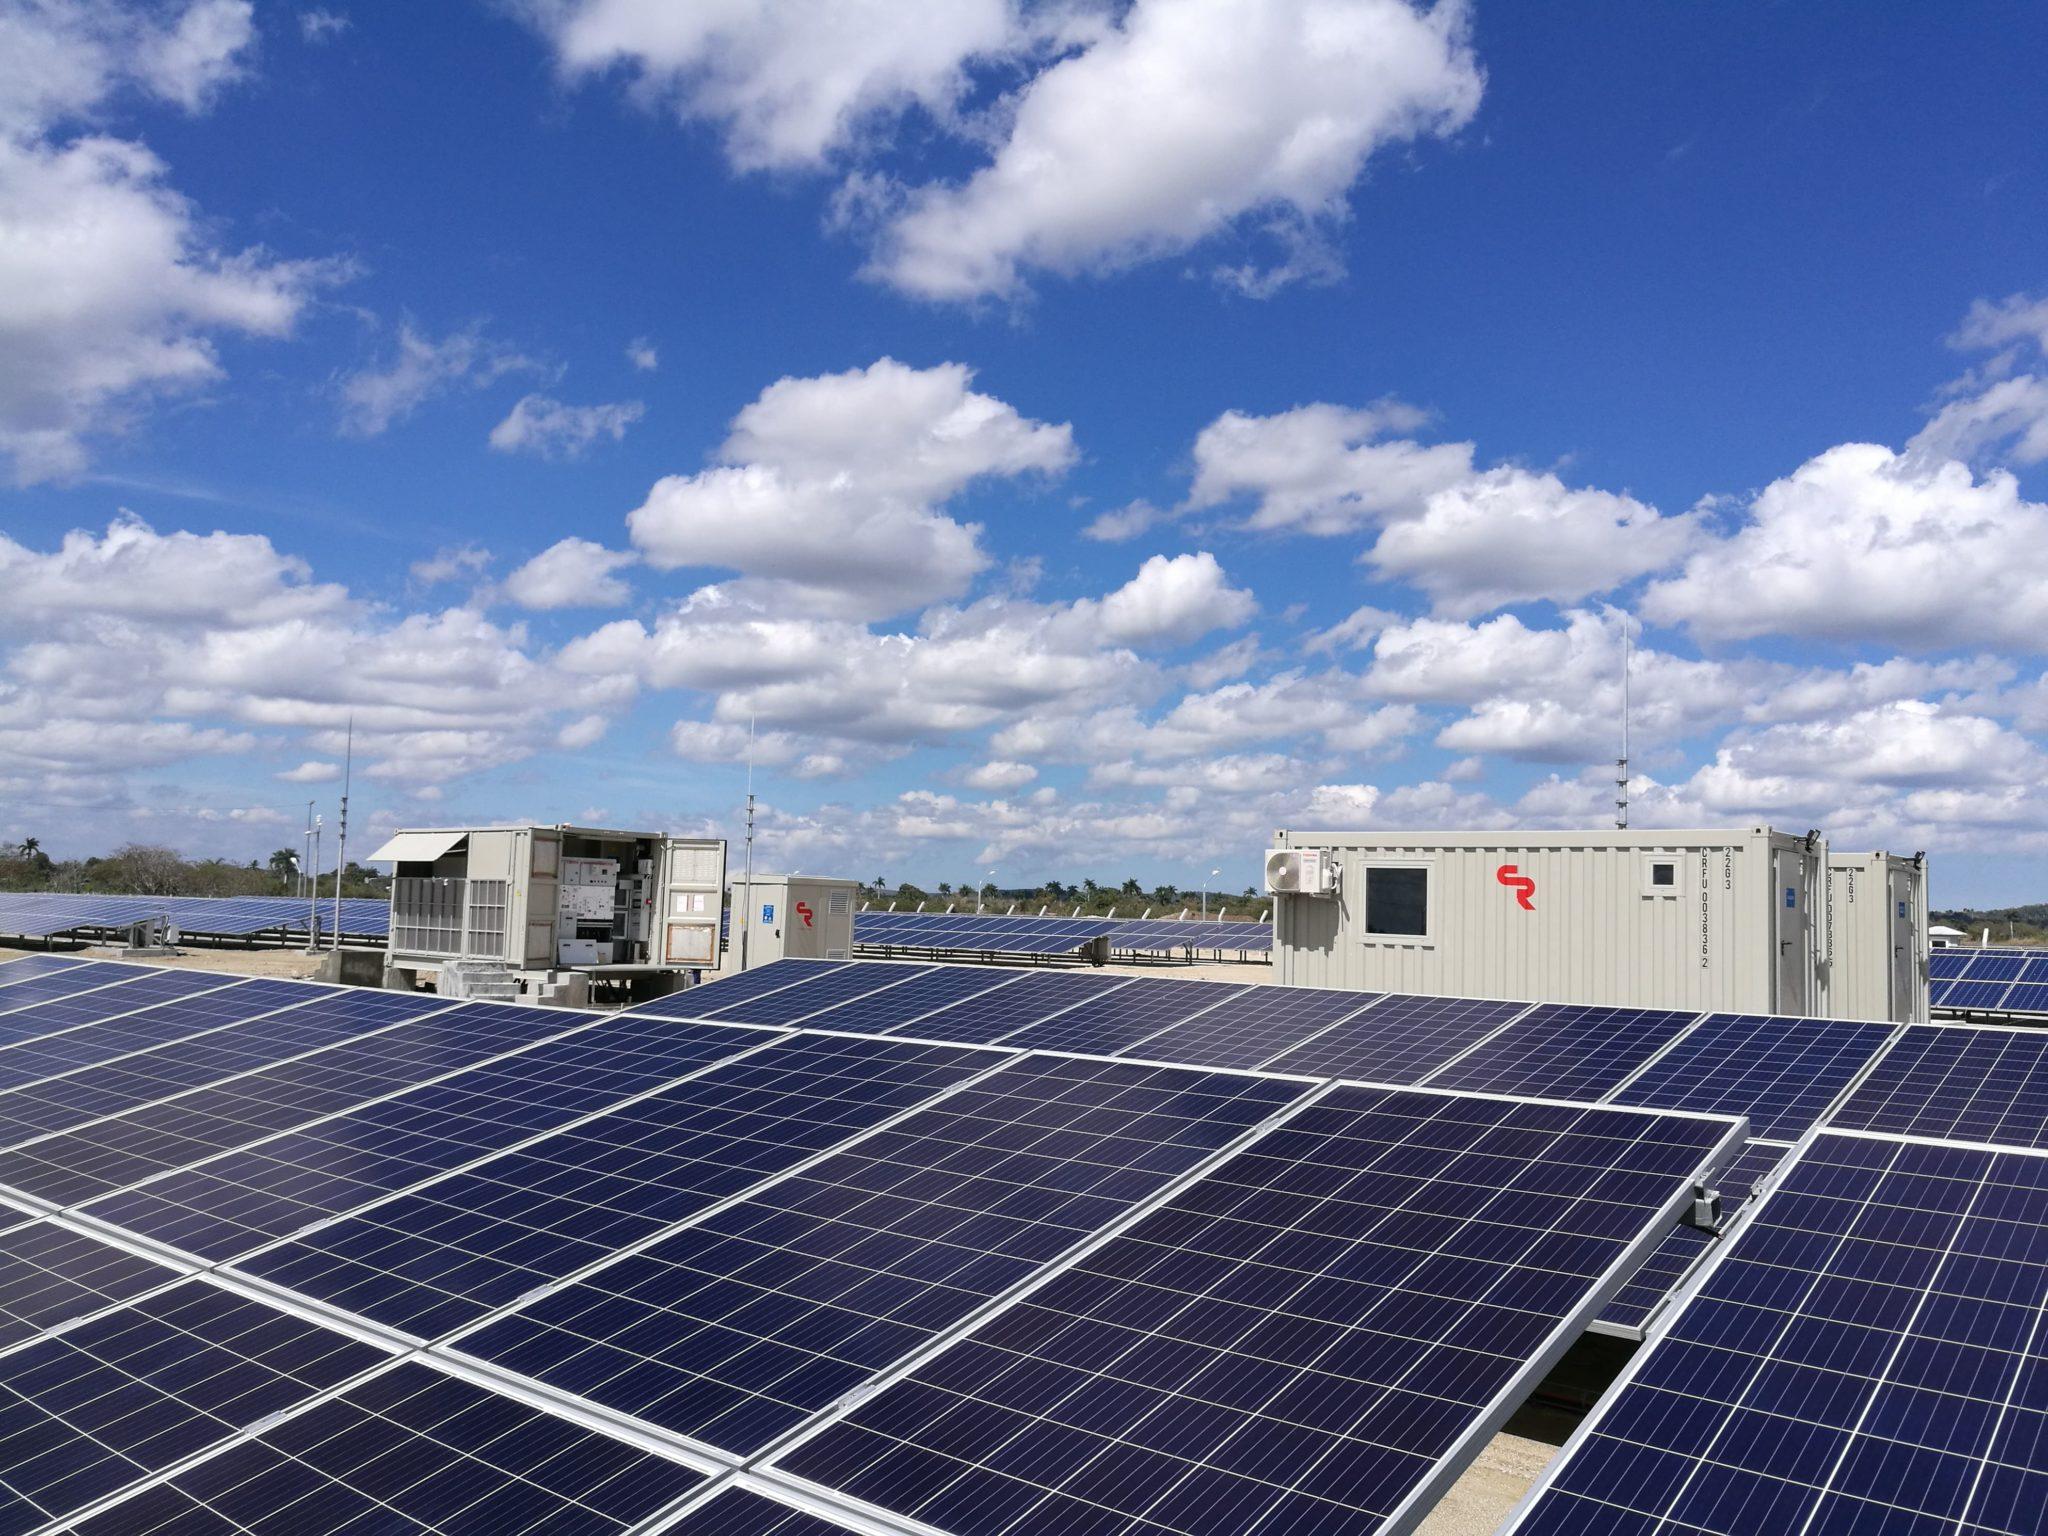 photovoltaic plant